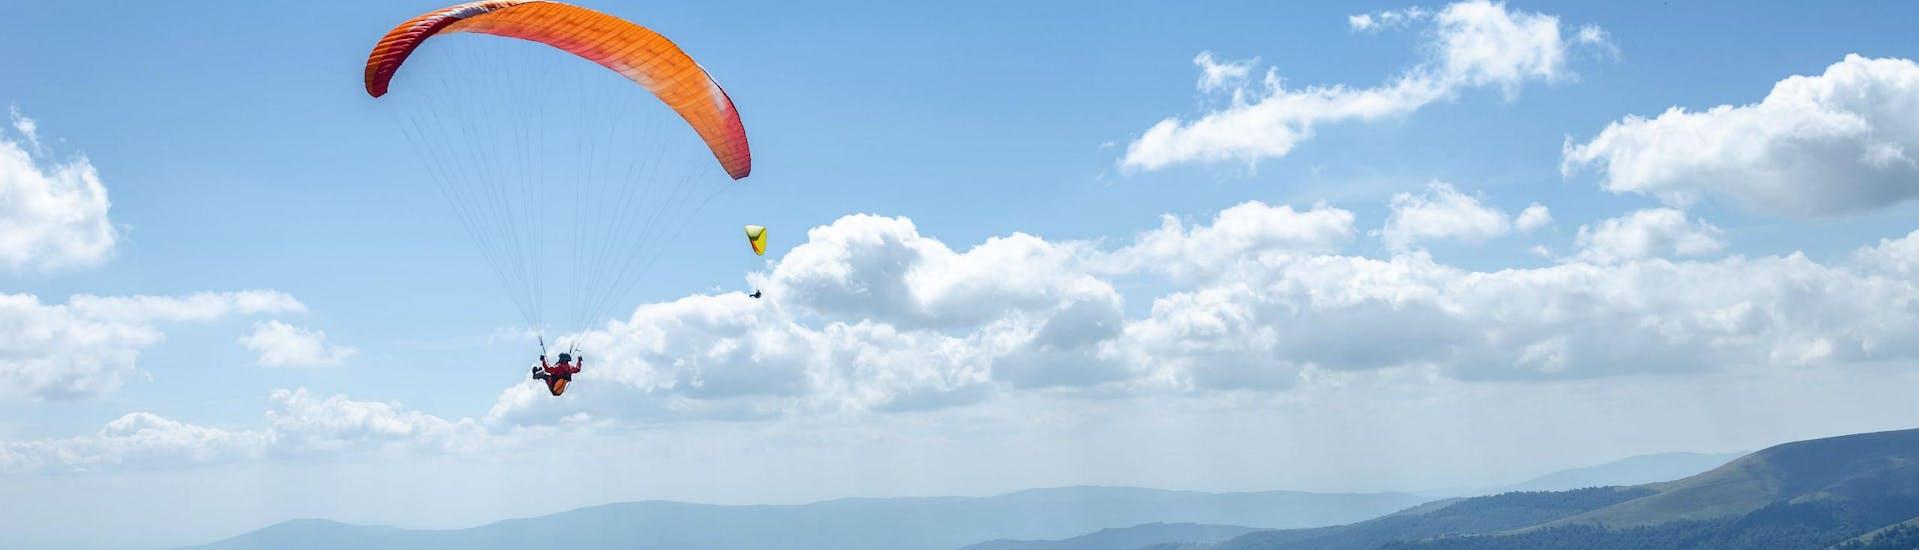 Tandem Paragliding for Kids (4-16 years) - Lake Geneva